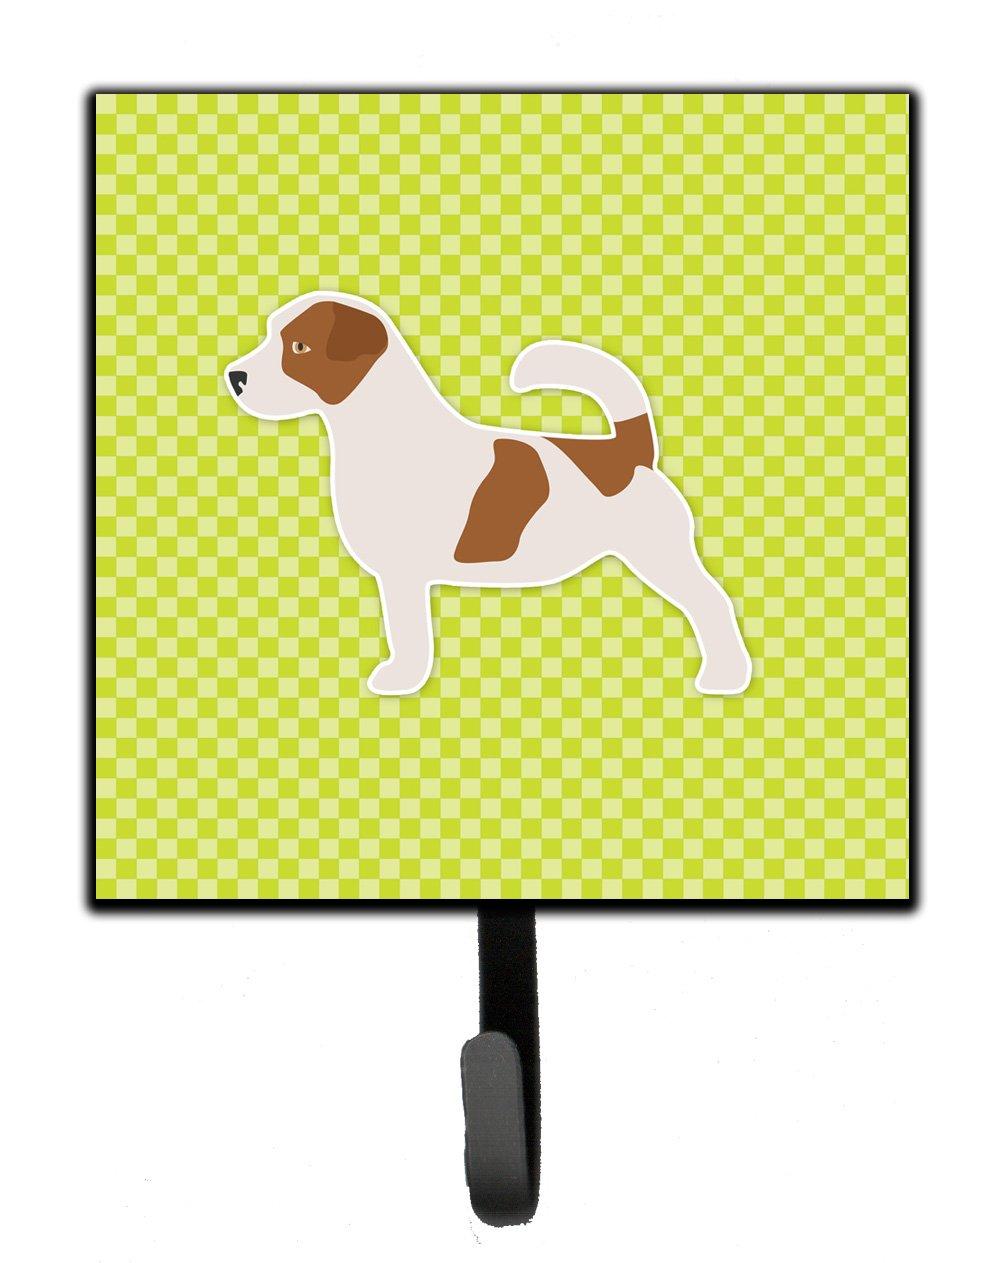 Carolines Treasures Jack Russell Terrier Checkerboard Green Leash or Key Holder BB3807SH4 Small Multicolor